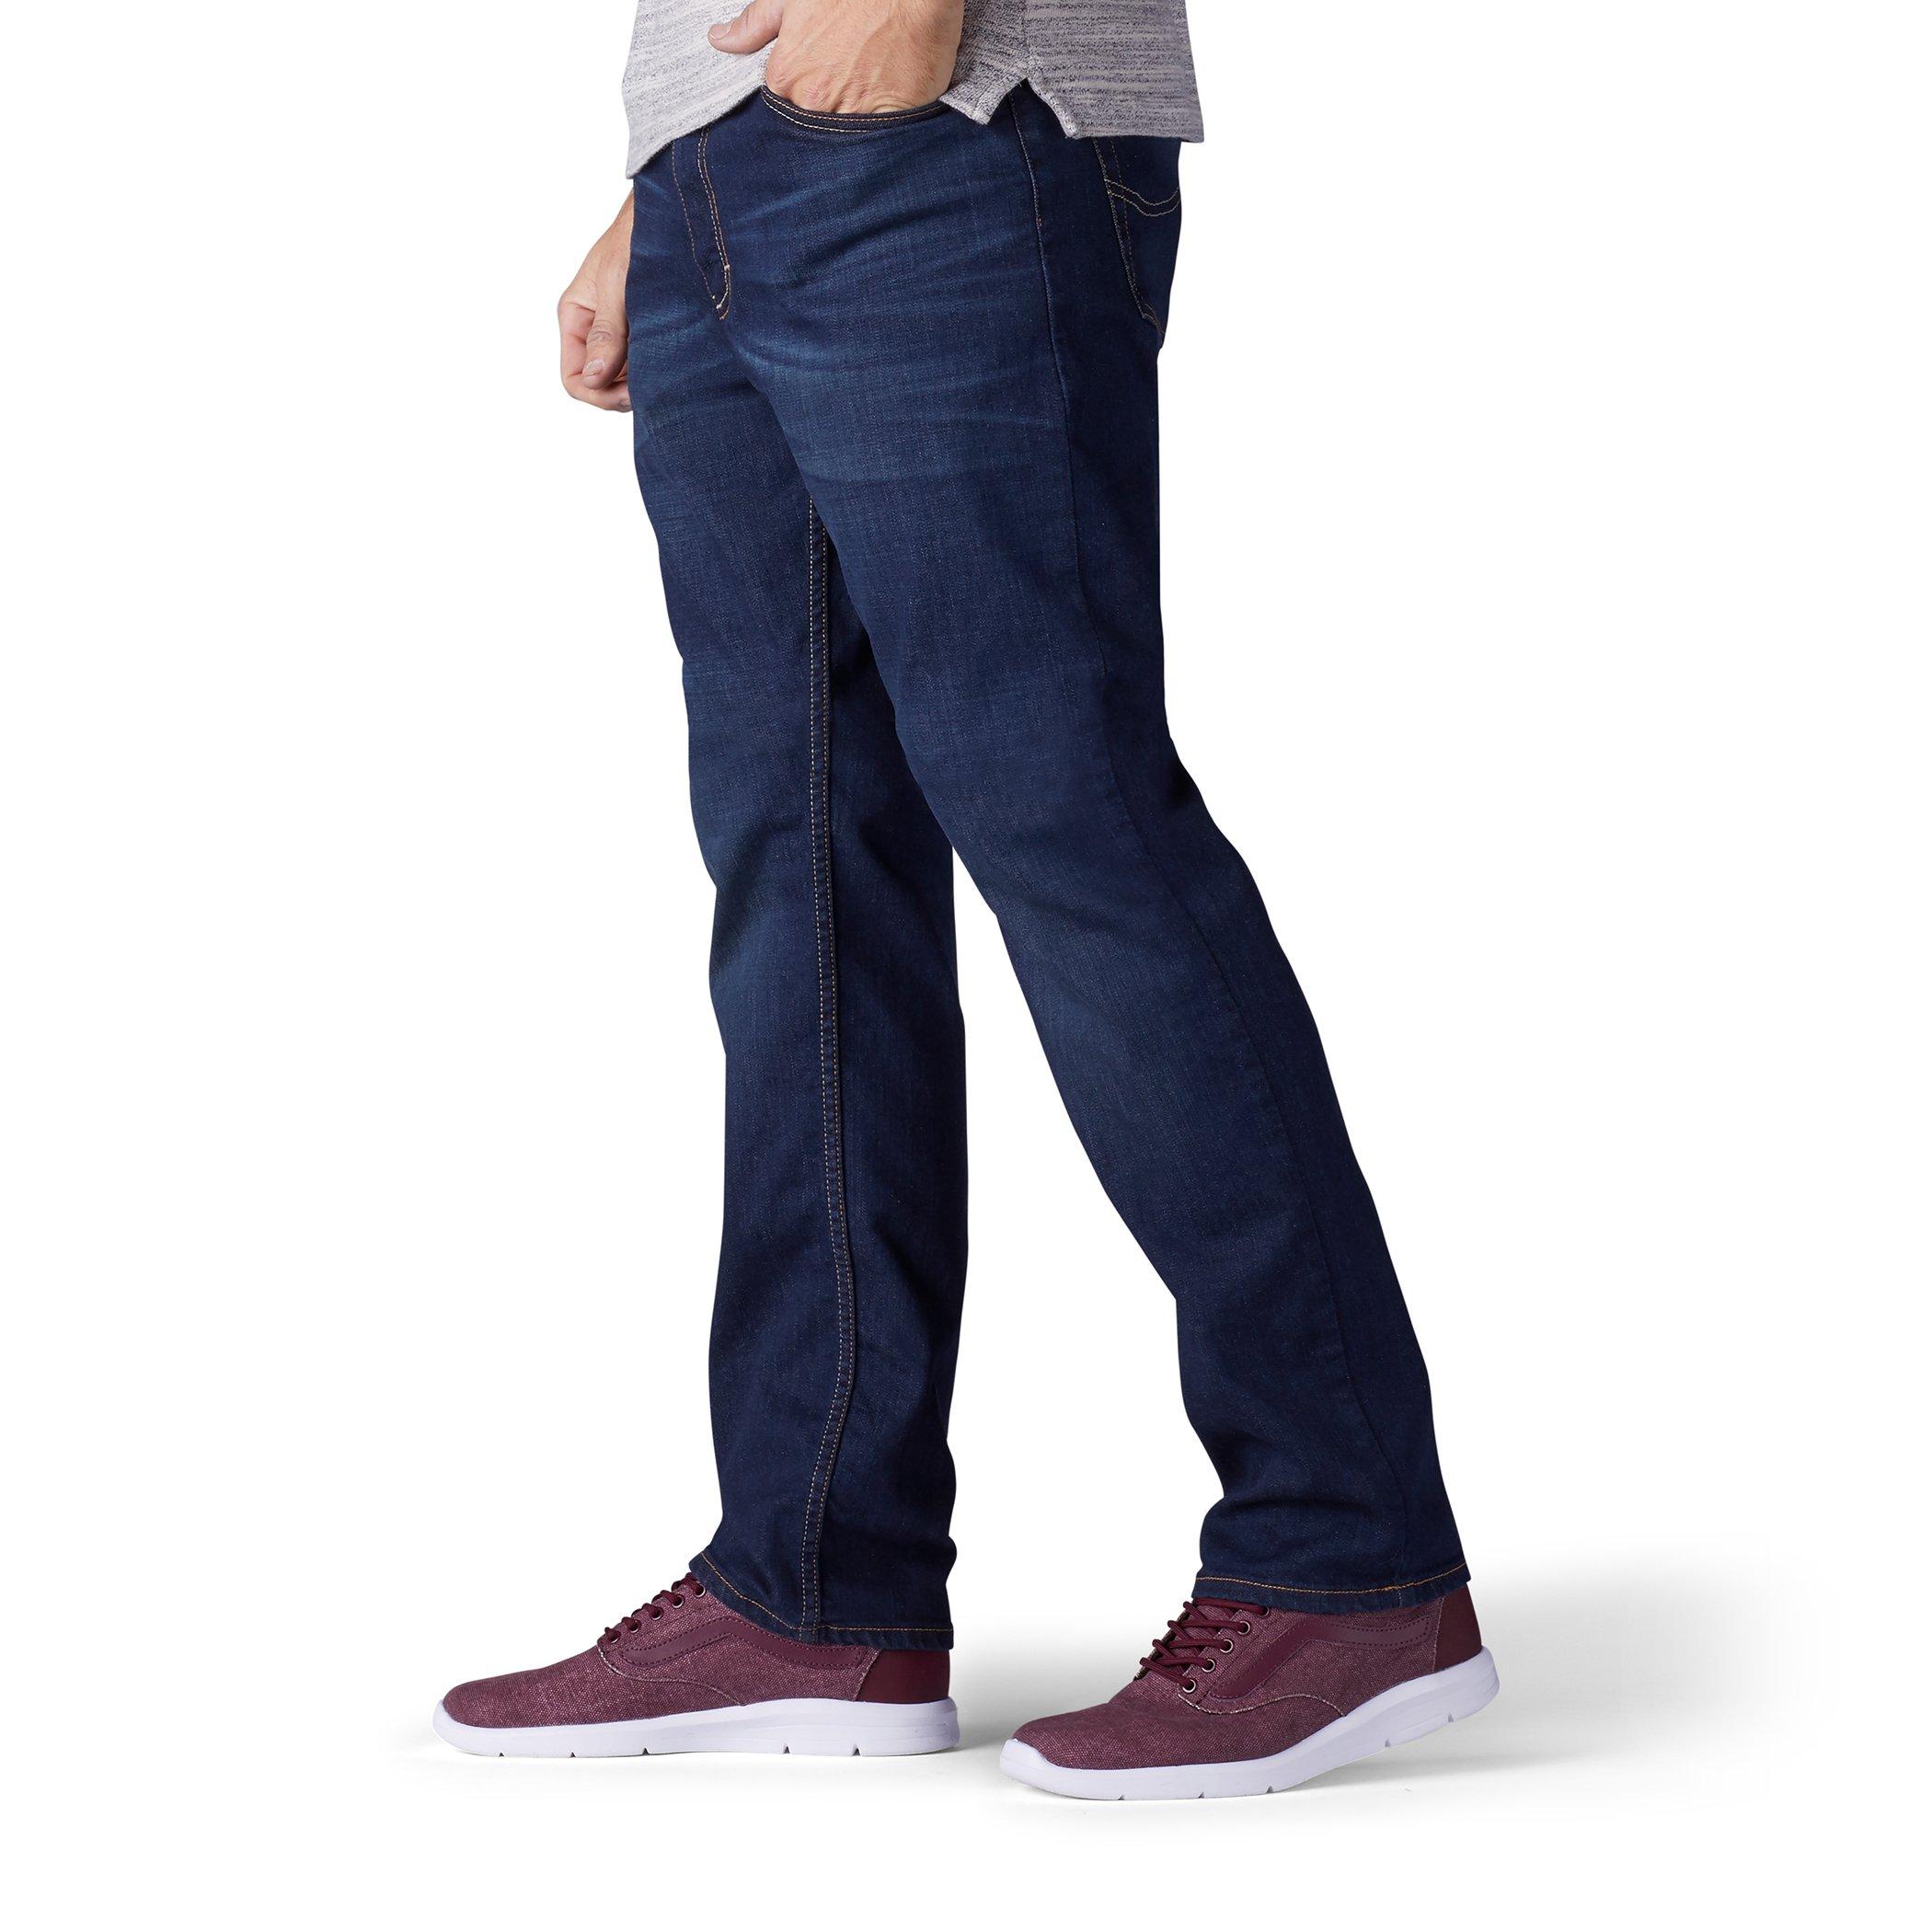 9e3a9f1c8bf40 LEE Men's Premium Flex Denim Regular Fit